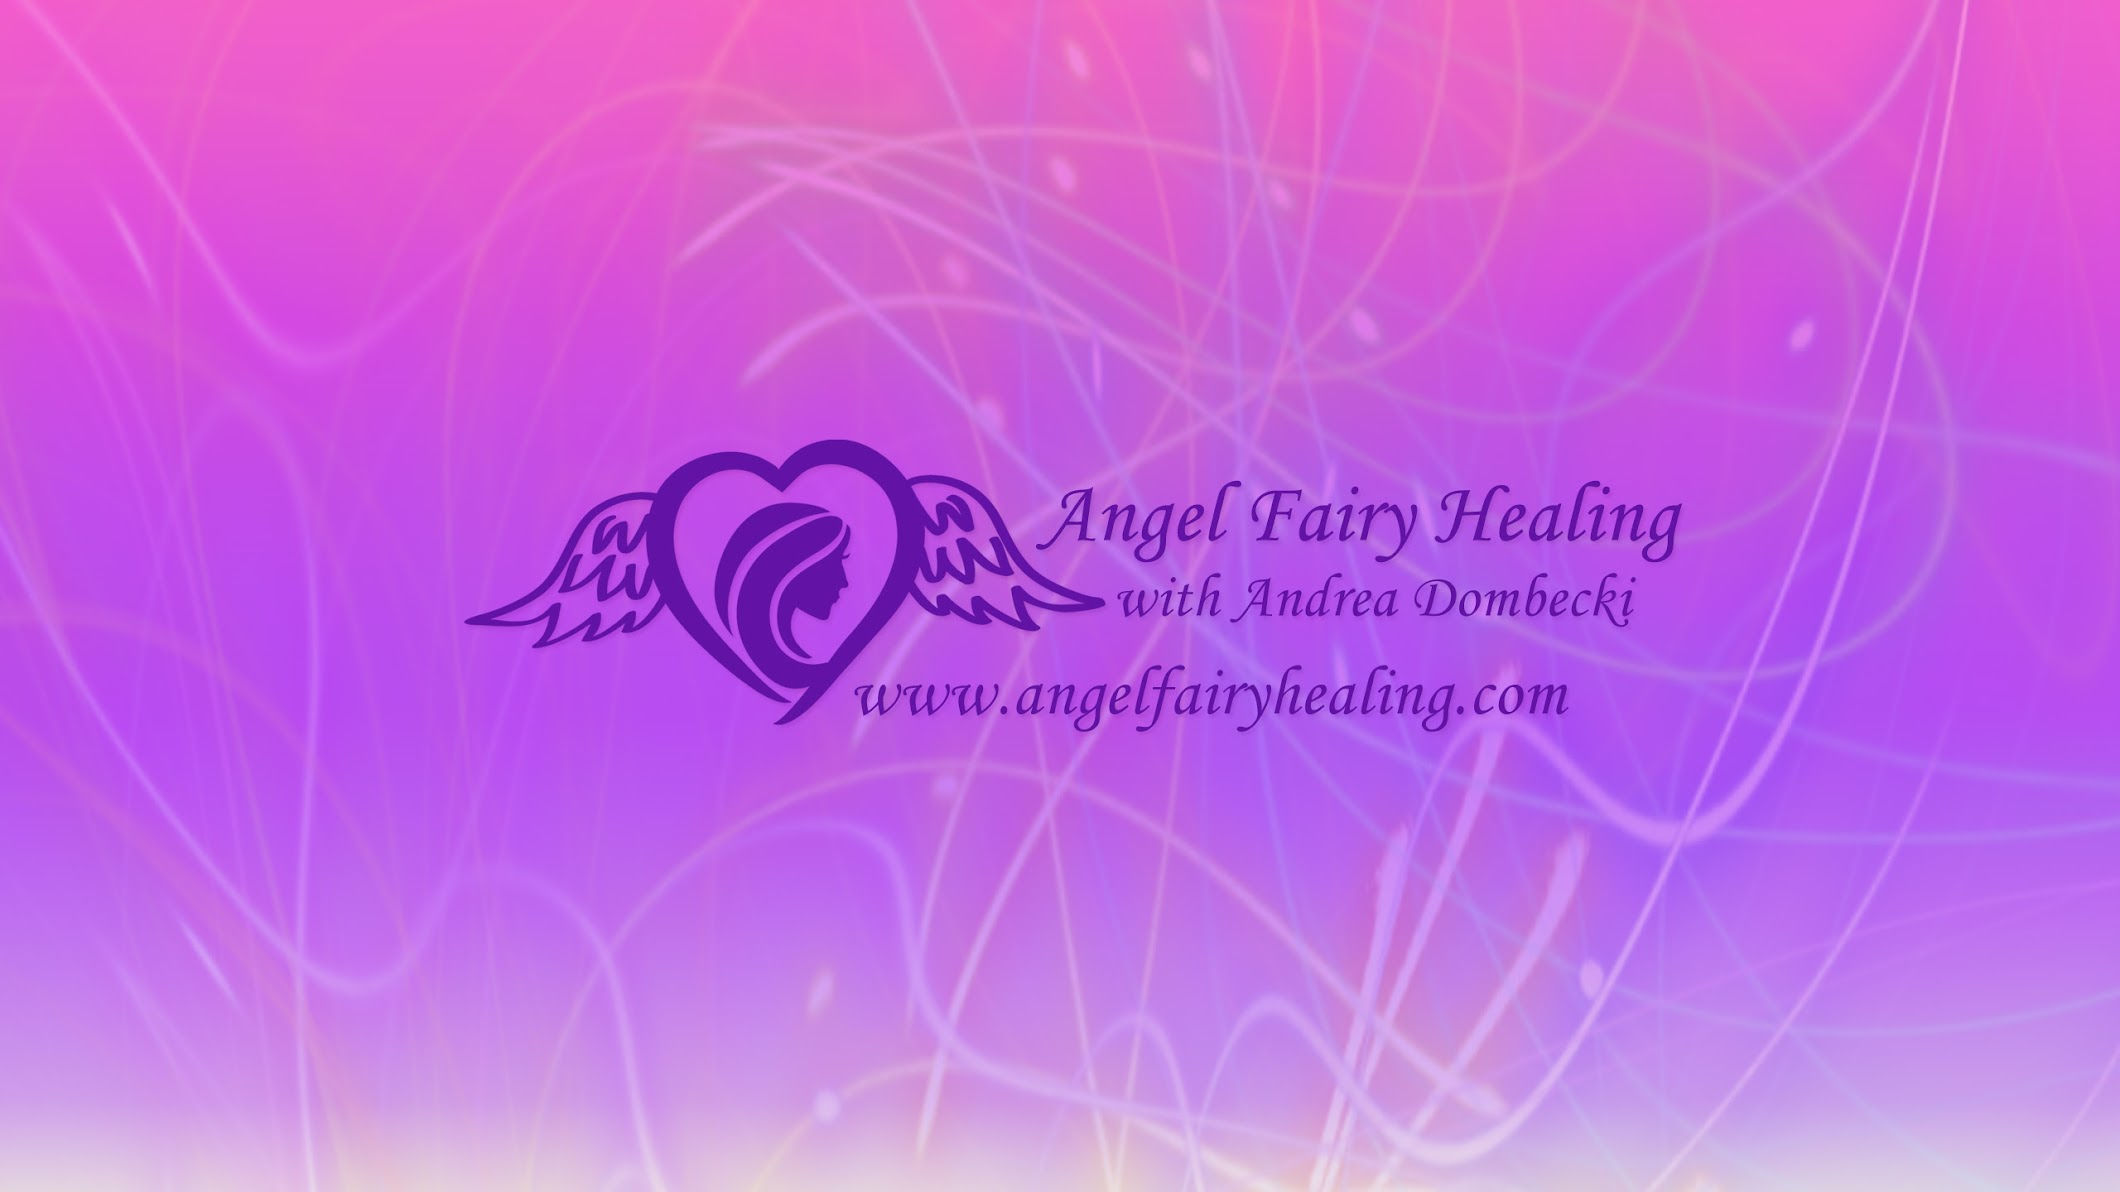 Angel Fairy Healing